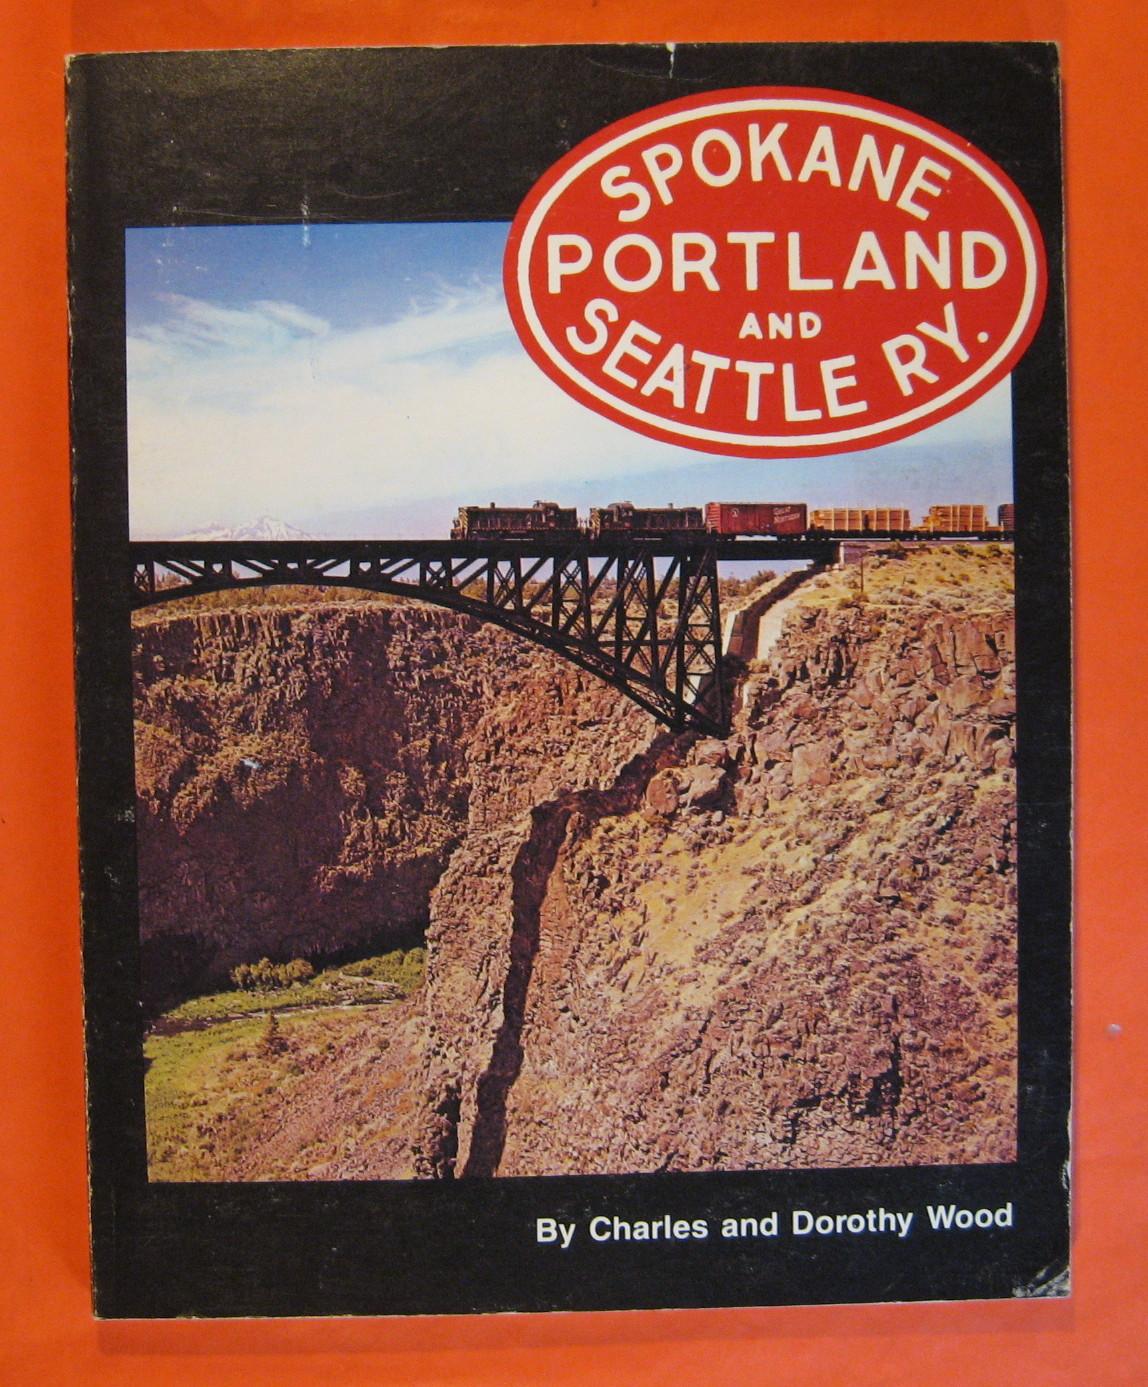 Spokane Portland & Seattle Ry.: The Northwest's Own Railway, Charles Wood; Dorothy Wood